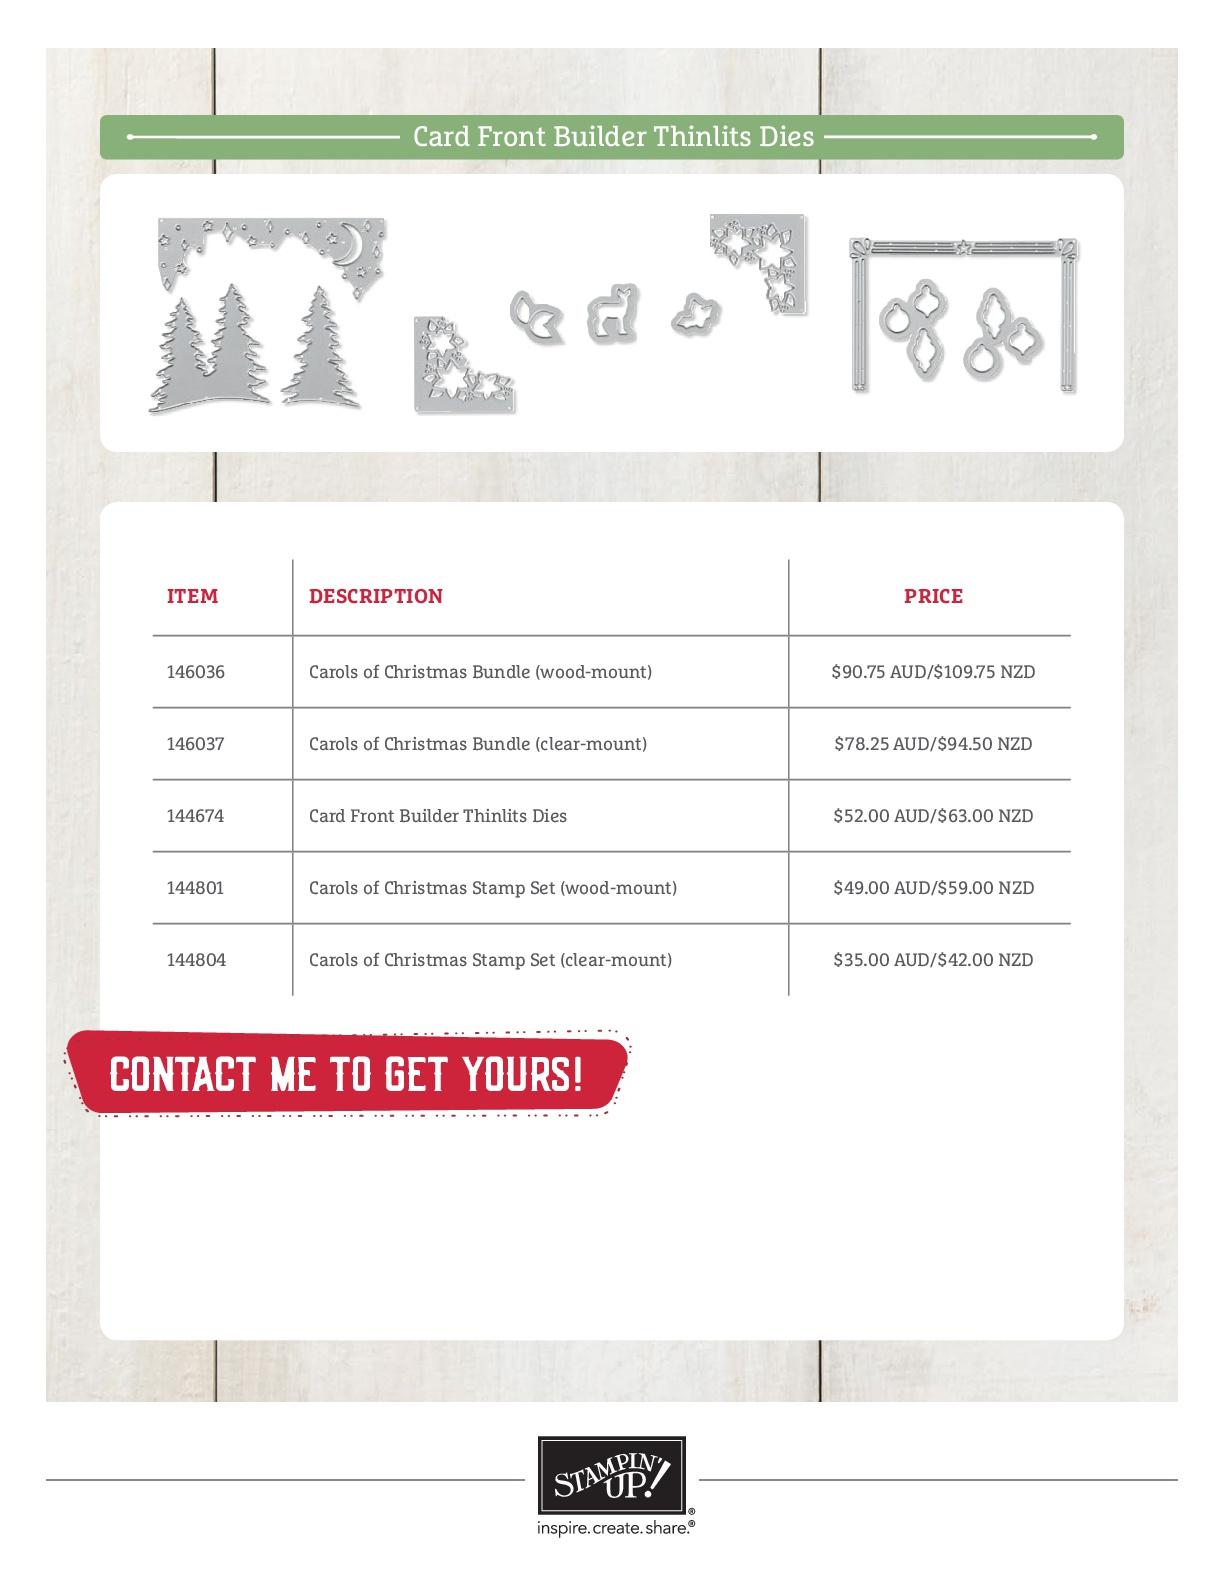 Carols-of-Christmas-flyer-002